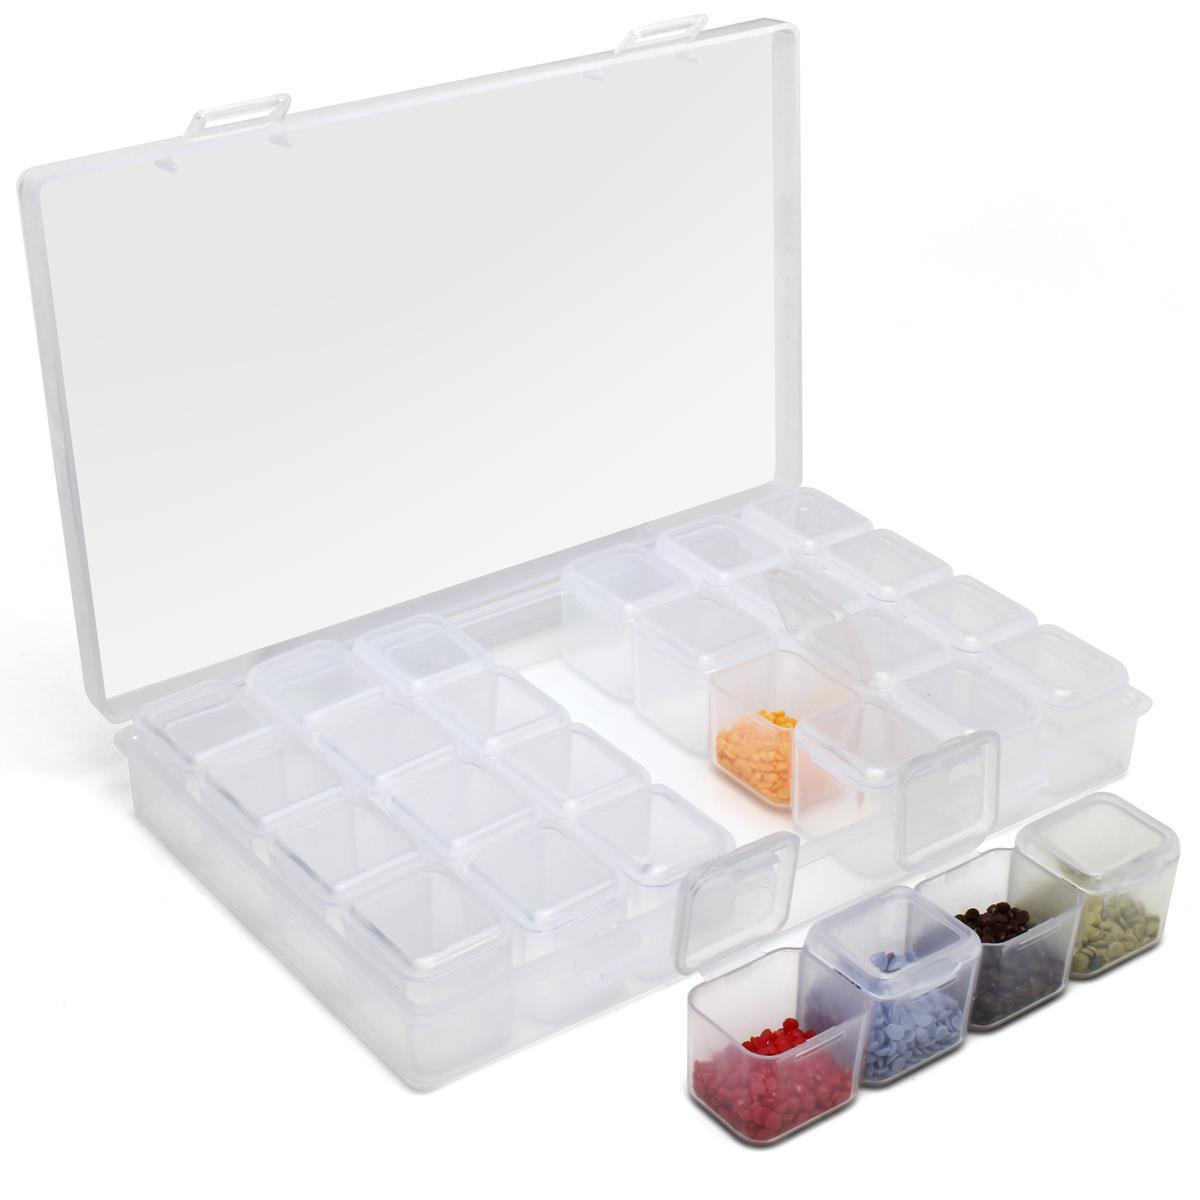 28-Diamond-Painting-Storage-Boxes-Bead-Organiser-Tray-Art-Beads-Embroidery-Case thumbnail 4